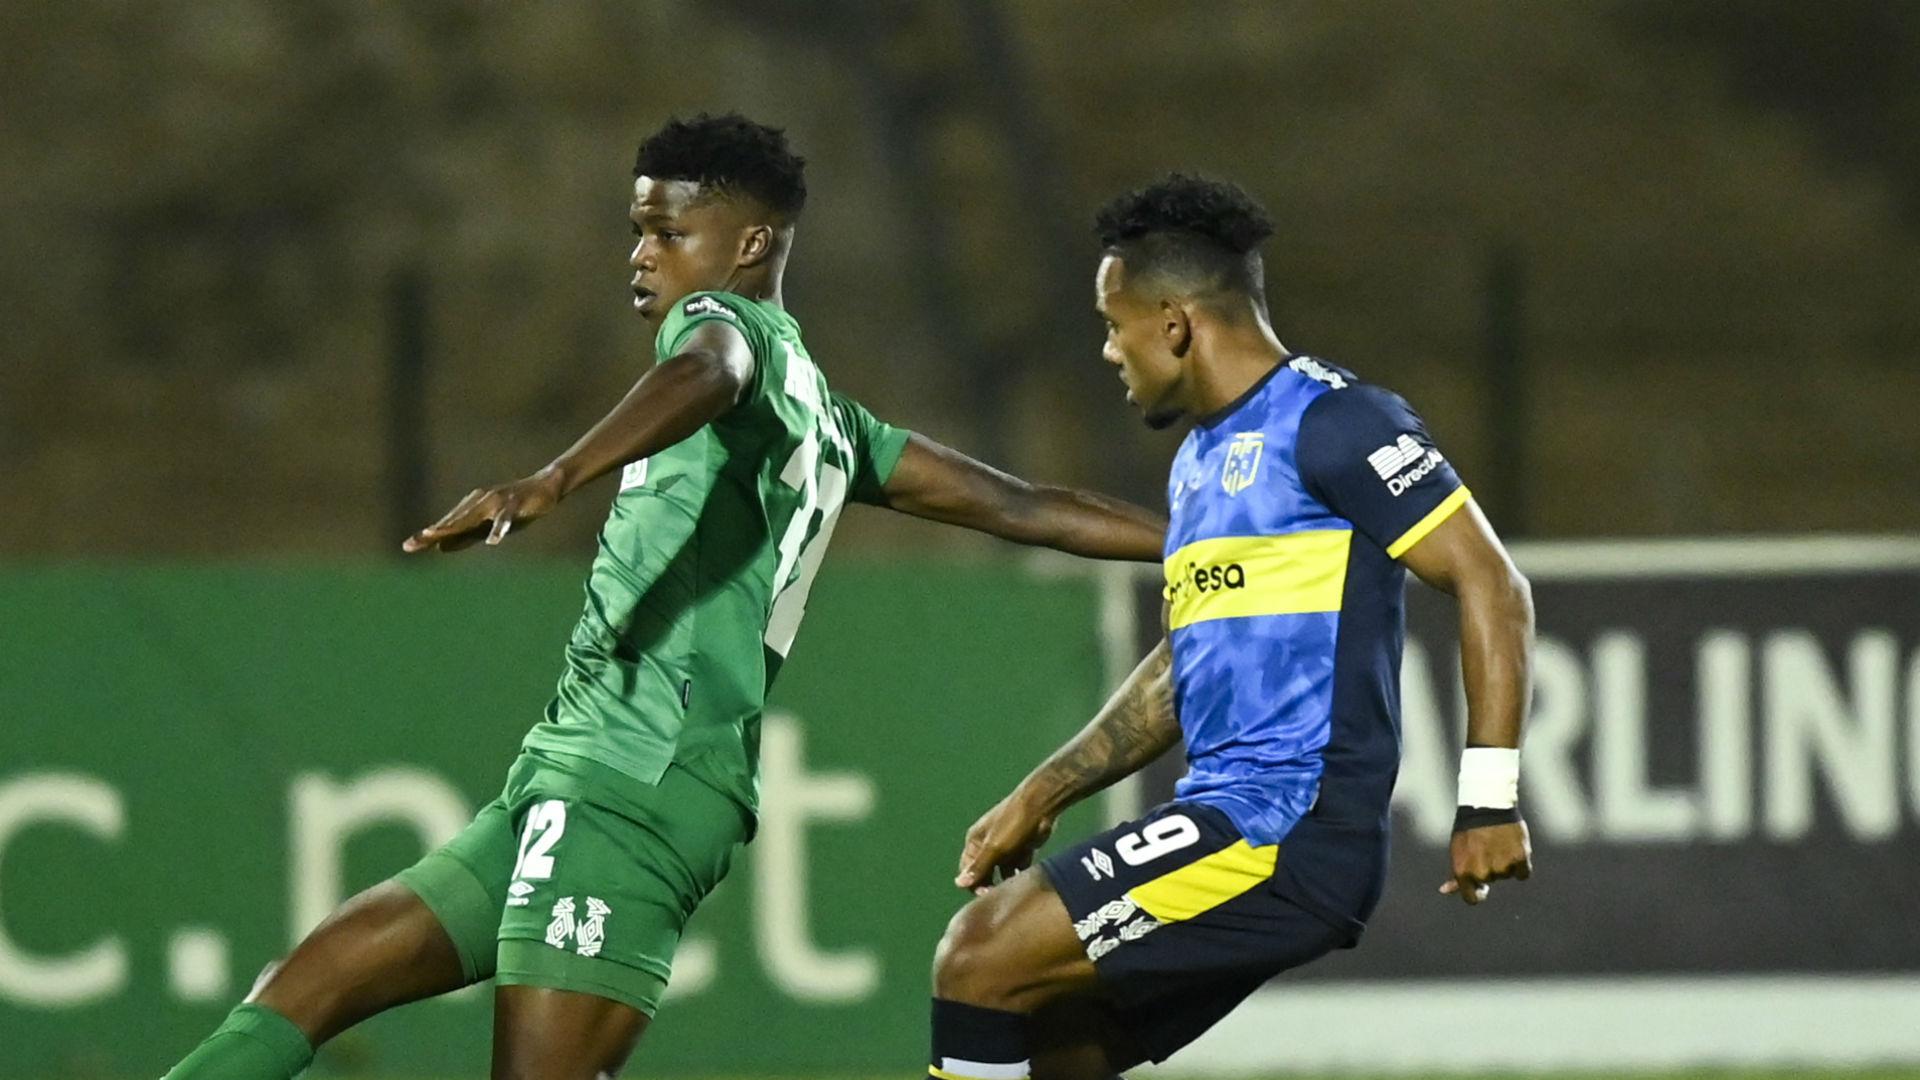 Tuesday S Psl Review Amazulu Edge Cape Town City Bidvest